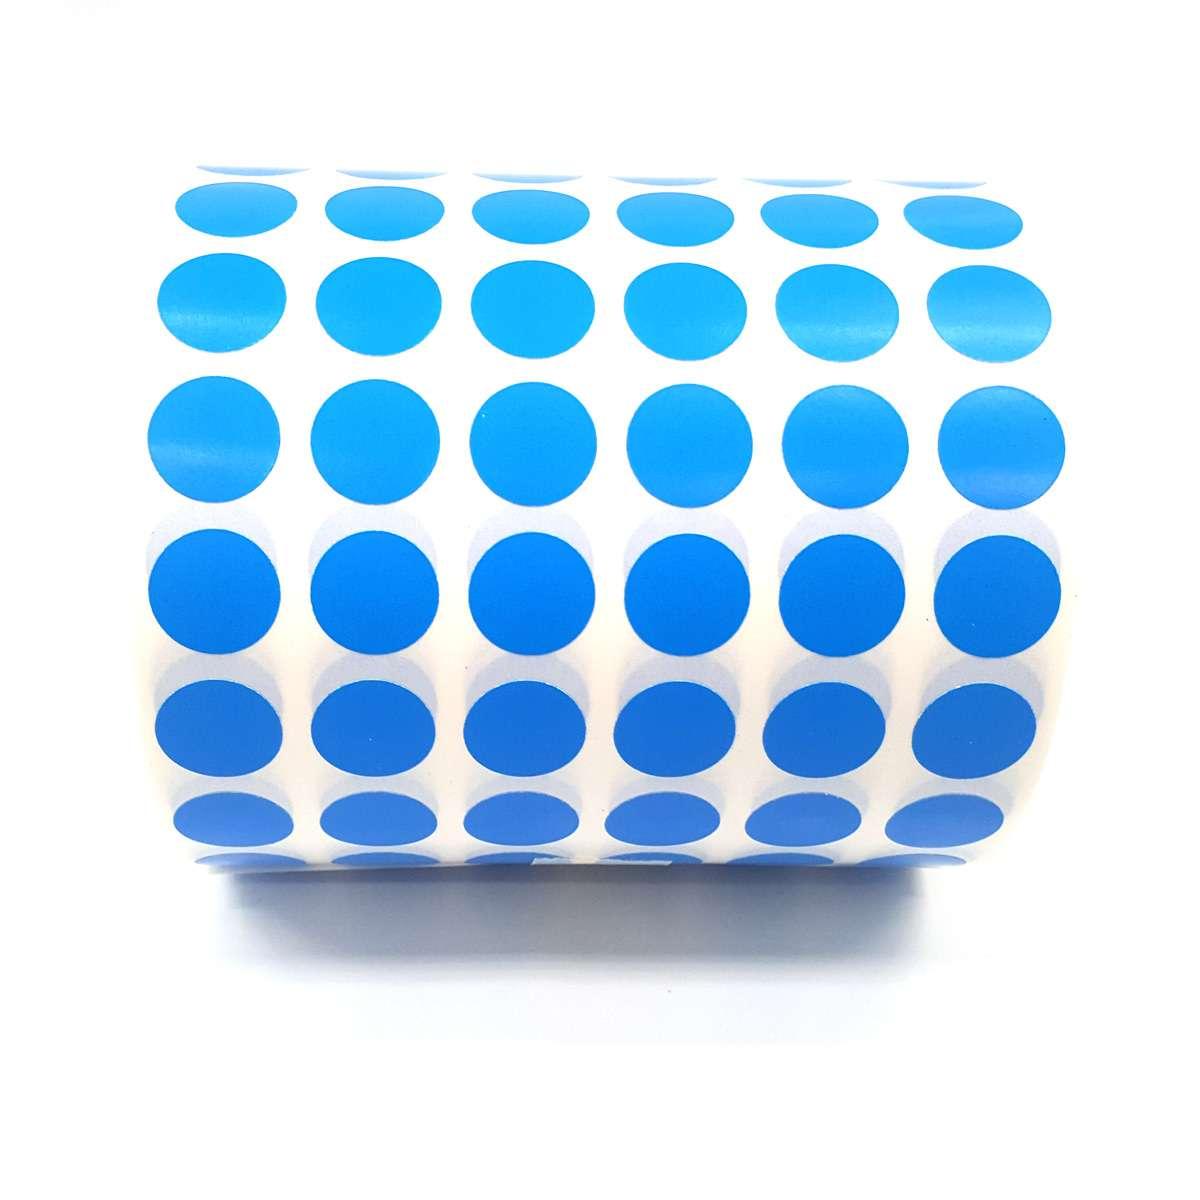 Etiqueta Bolinha 12mm Colorida 1000 Etiquetas